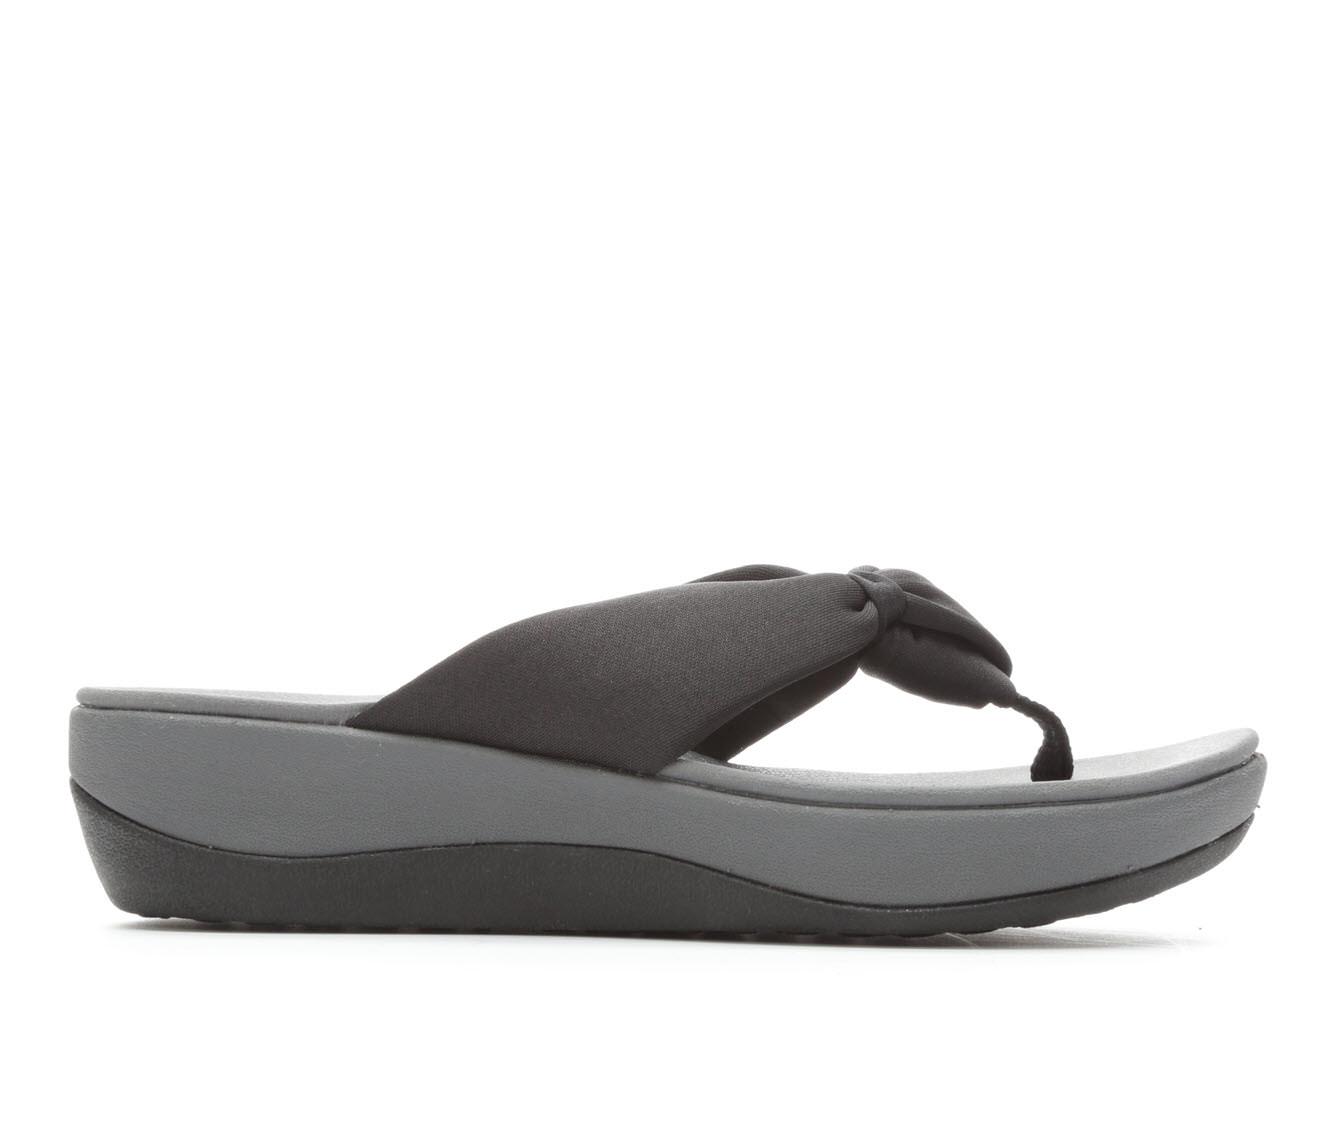 Women's Clarks Arla Glison Sandals (Black)